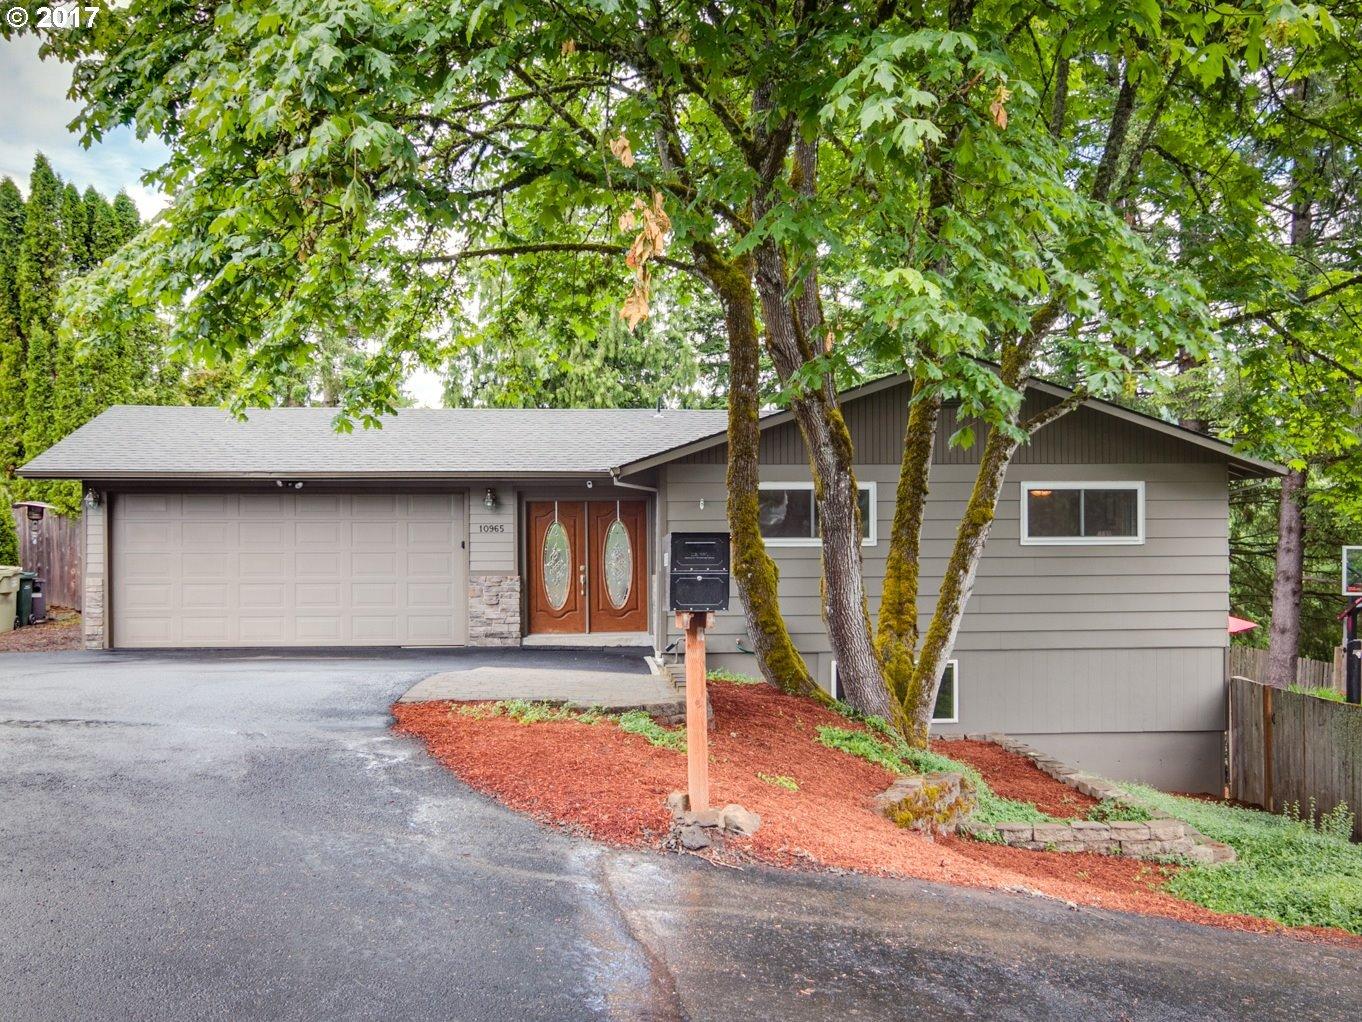 10965 NW RAINMONT RD, Portland, OR 97229